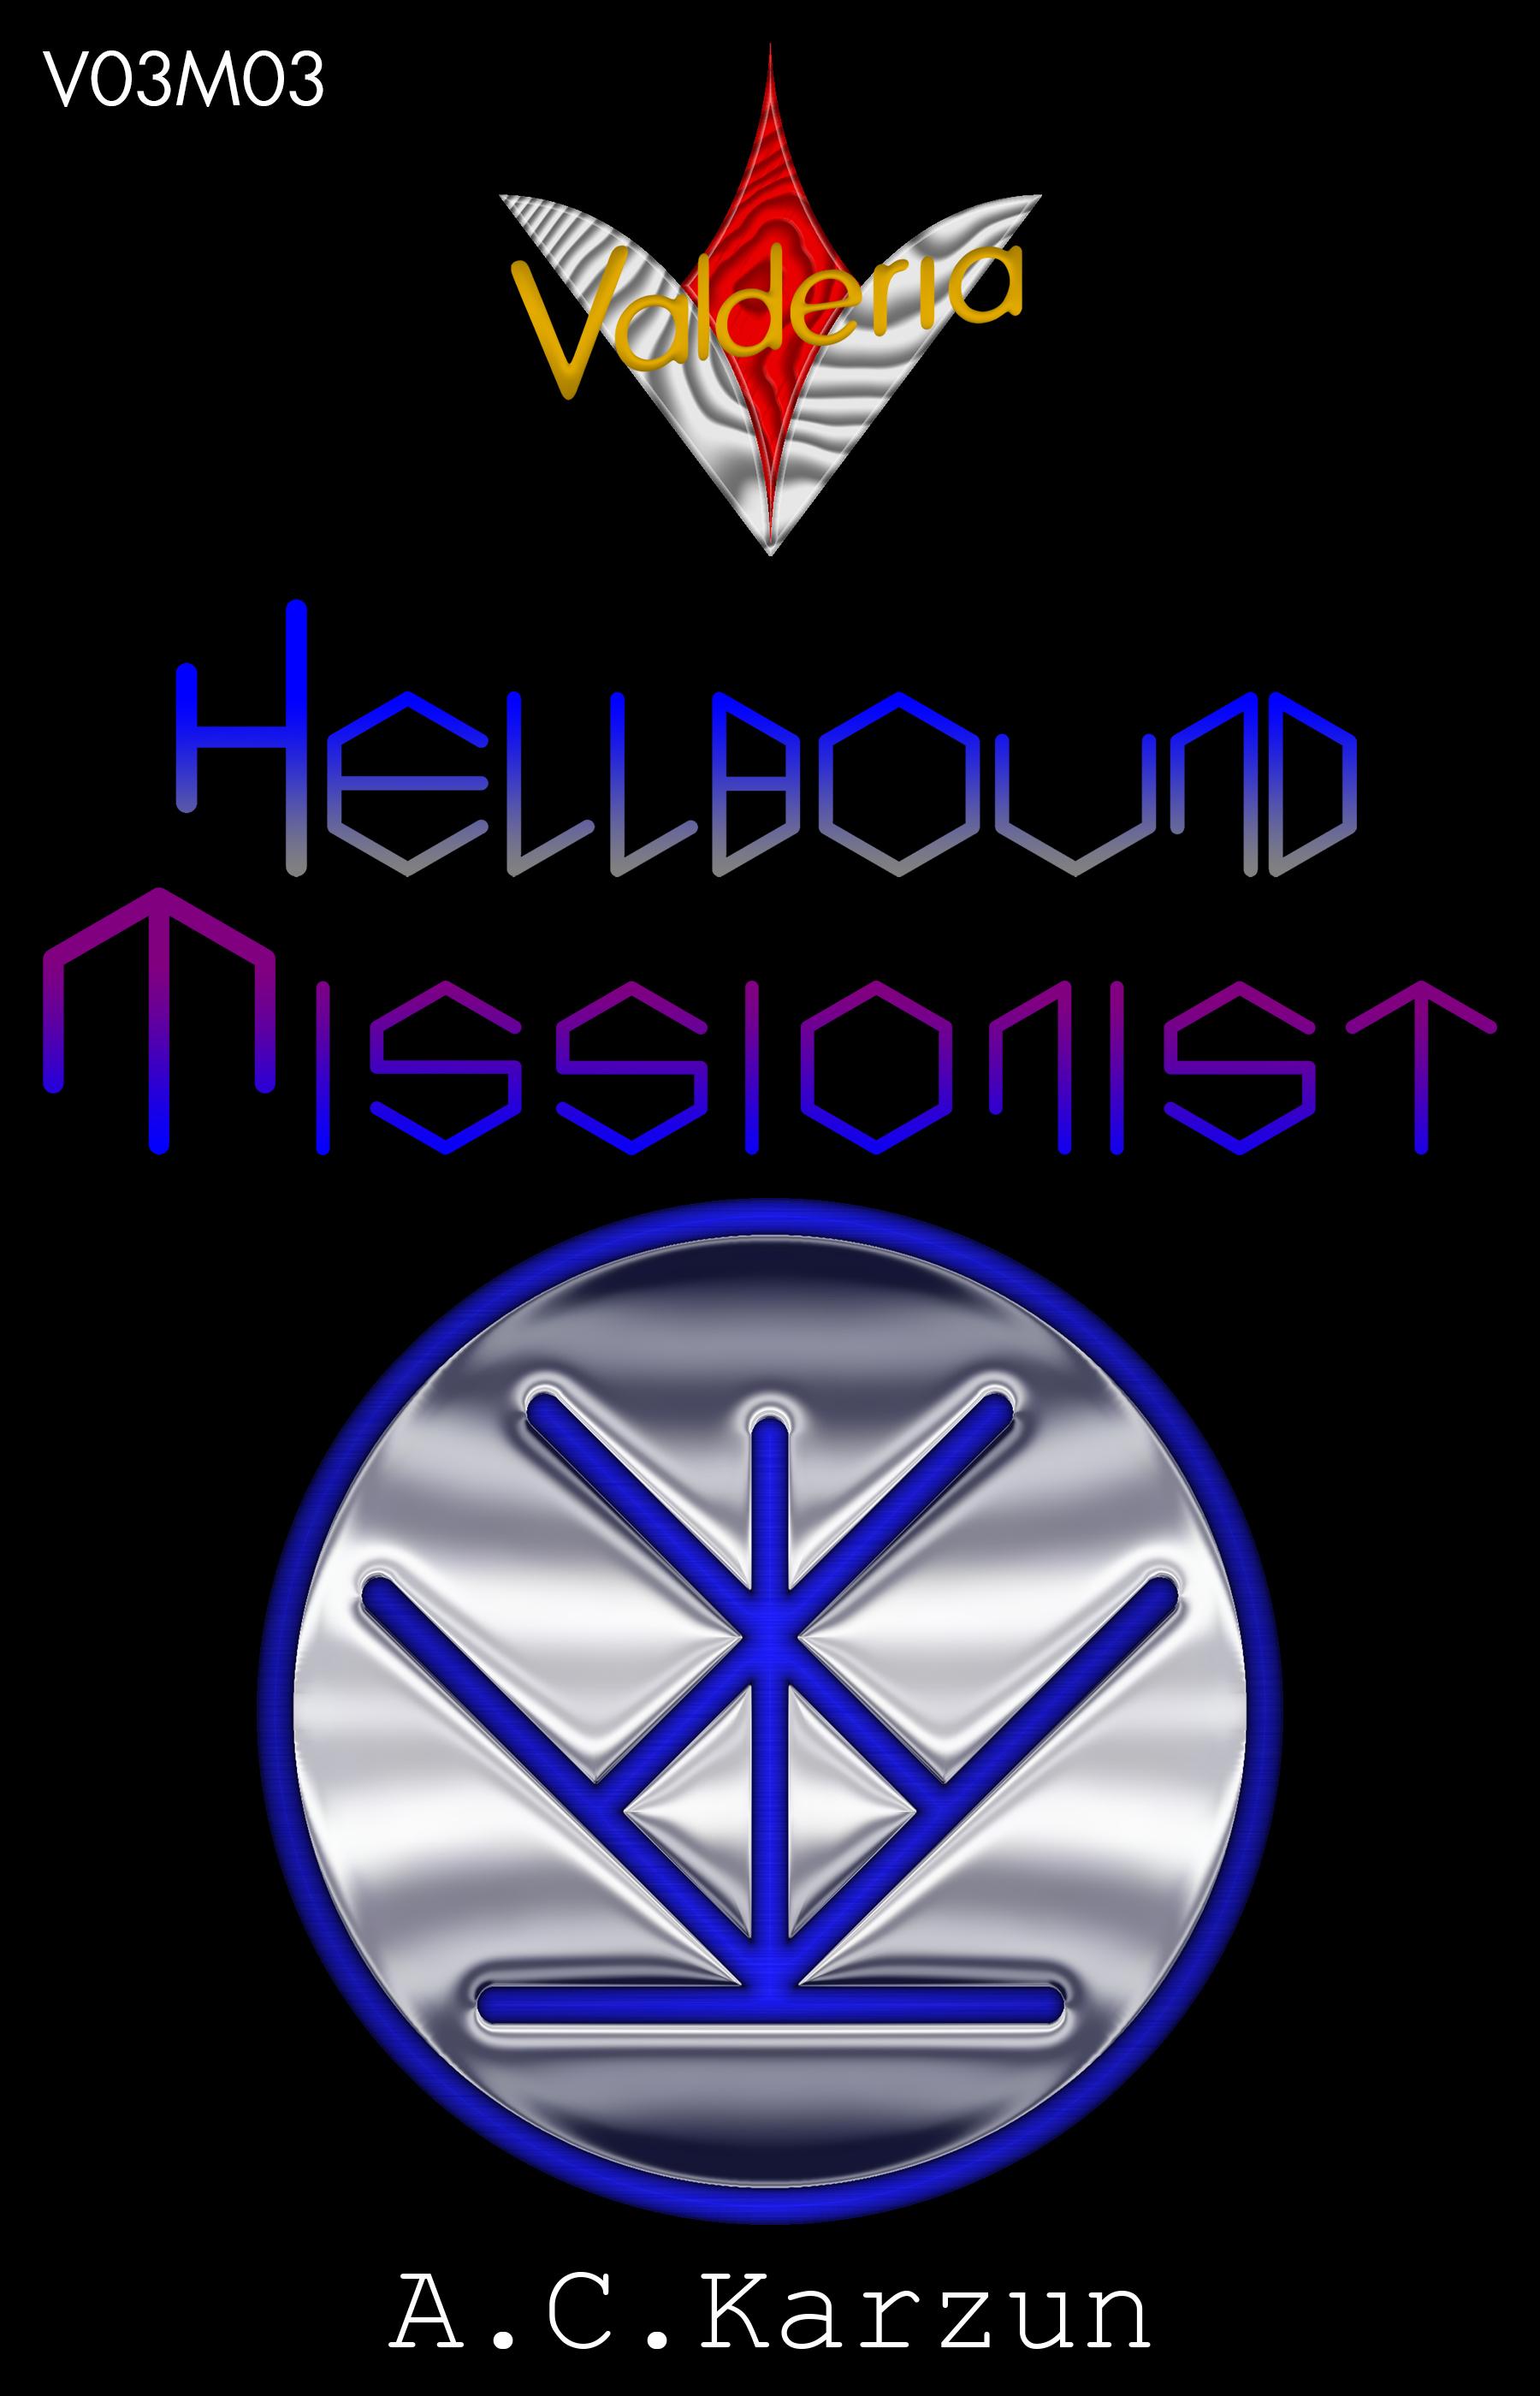 V03M03 Hellbound Missionist A.C. Karzun